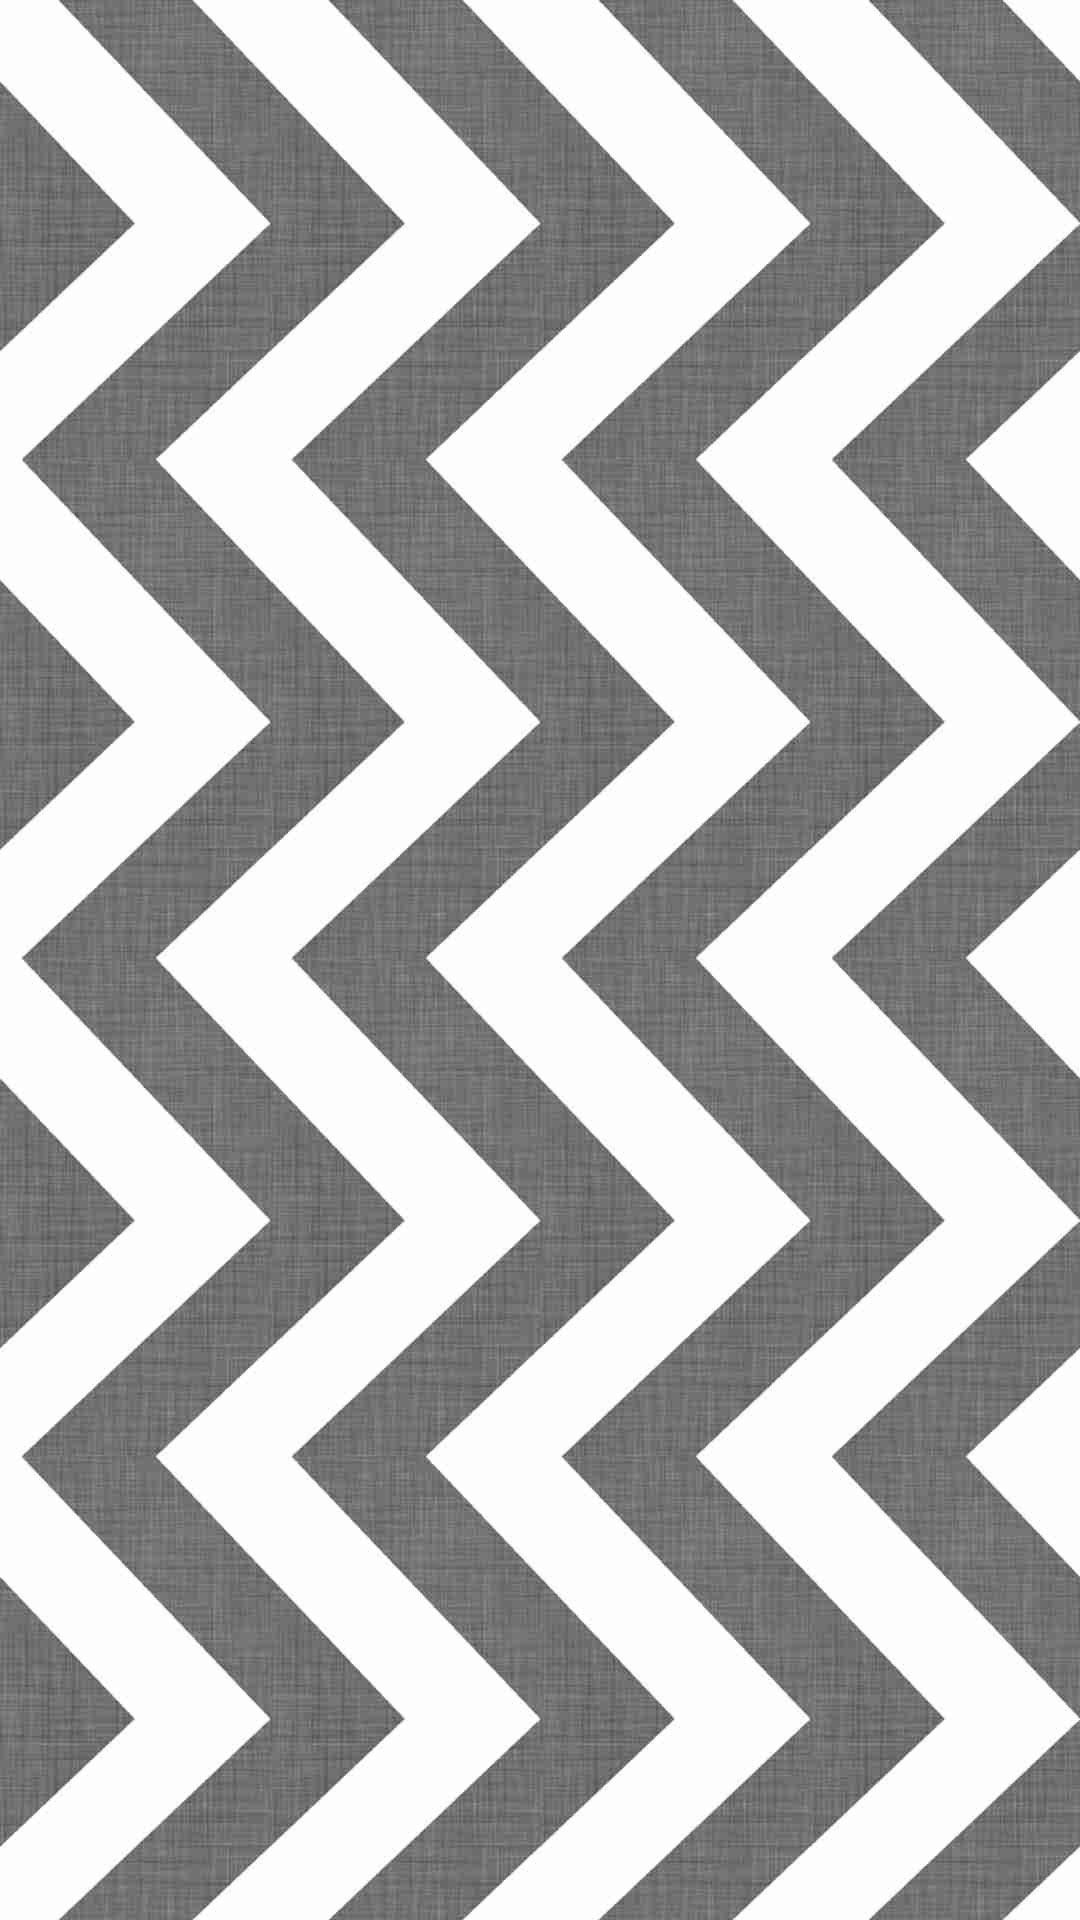 Grey And White Texture Chevron IPhone 6 Plus Wallpaper